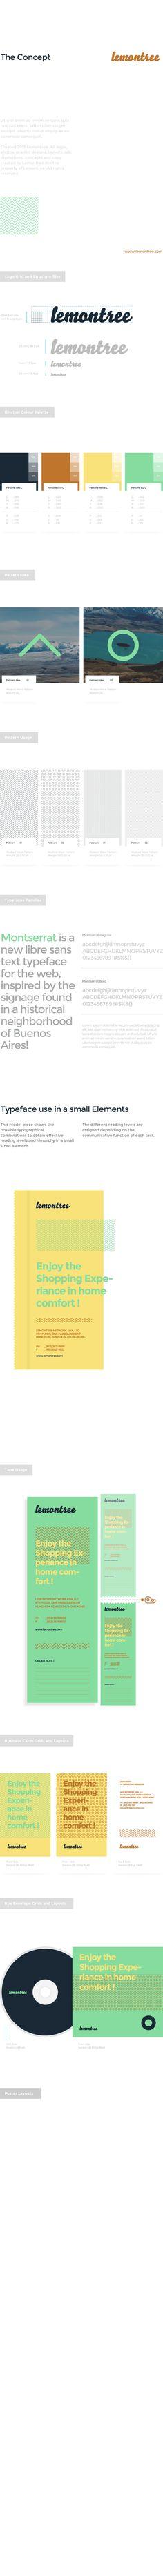 Lemontree Store Corporate Identity on Behance